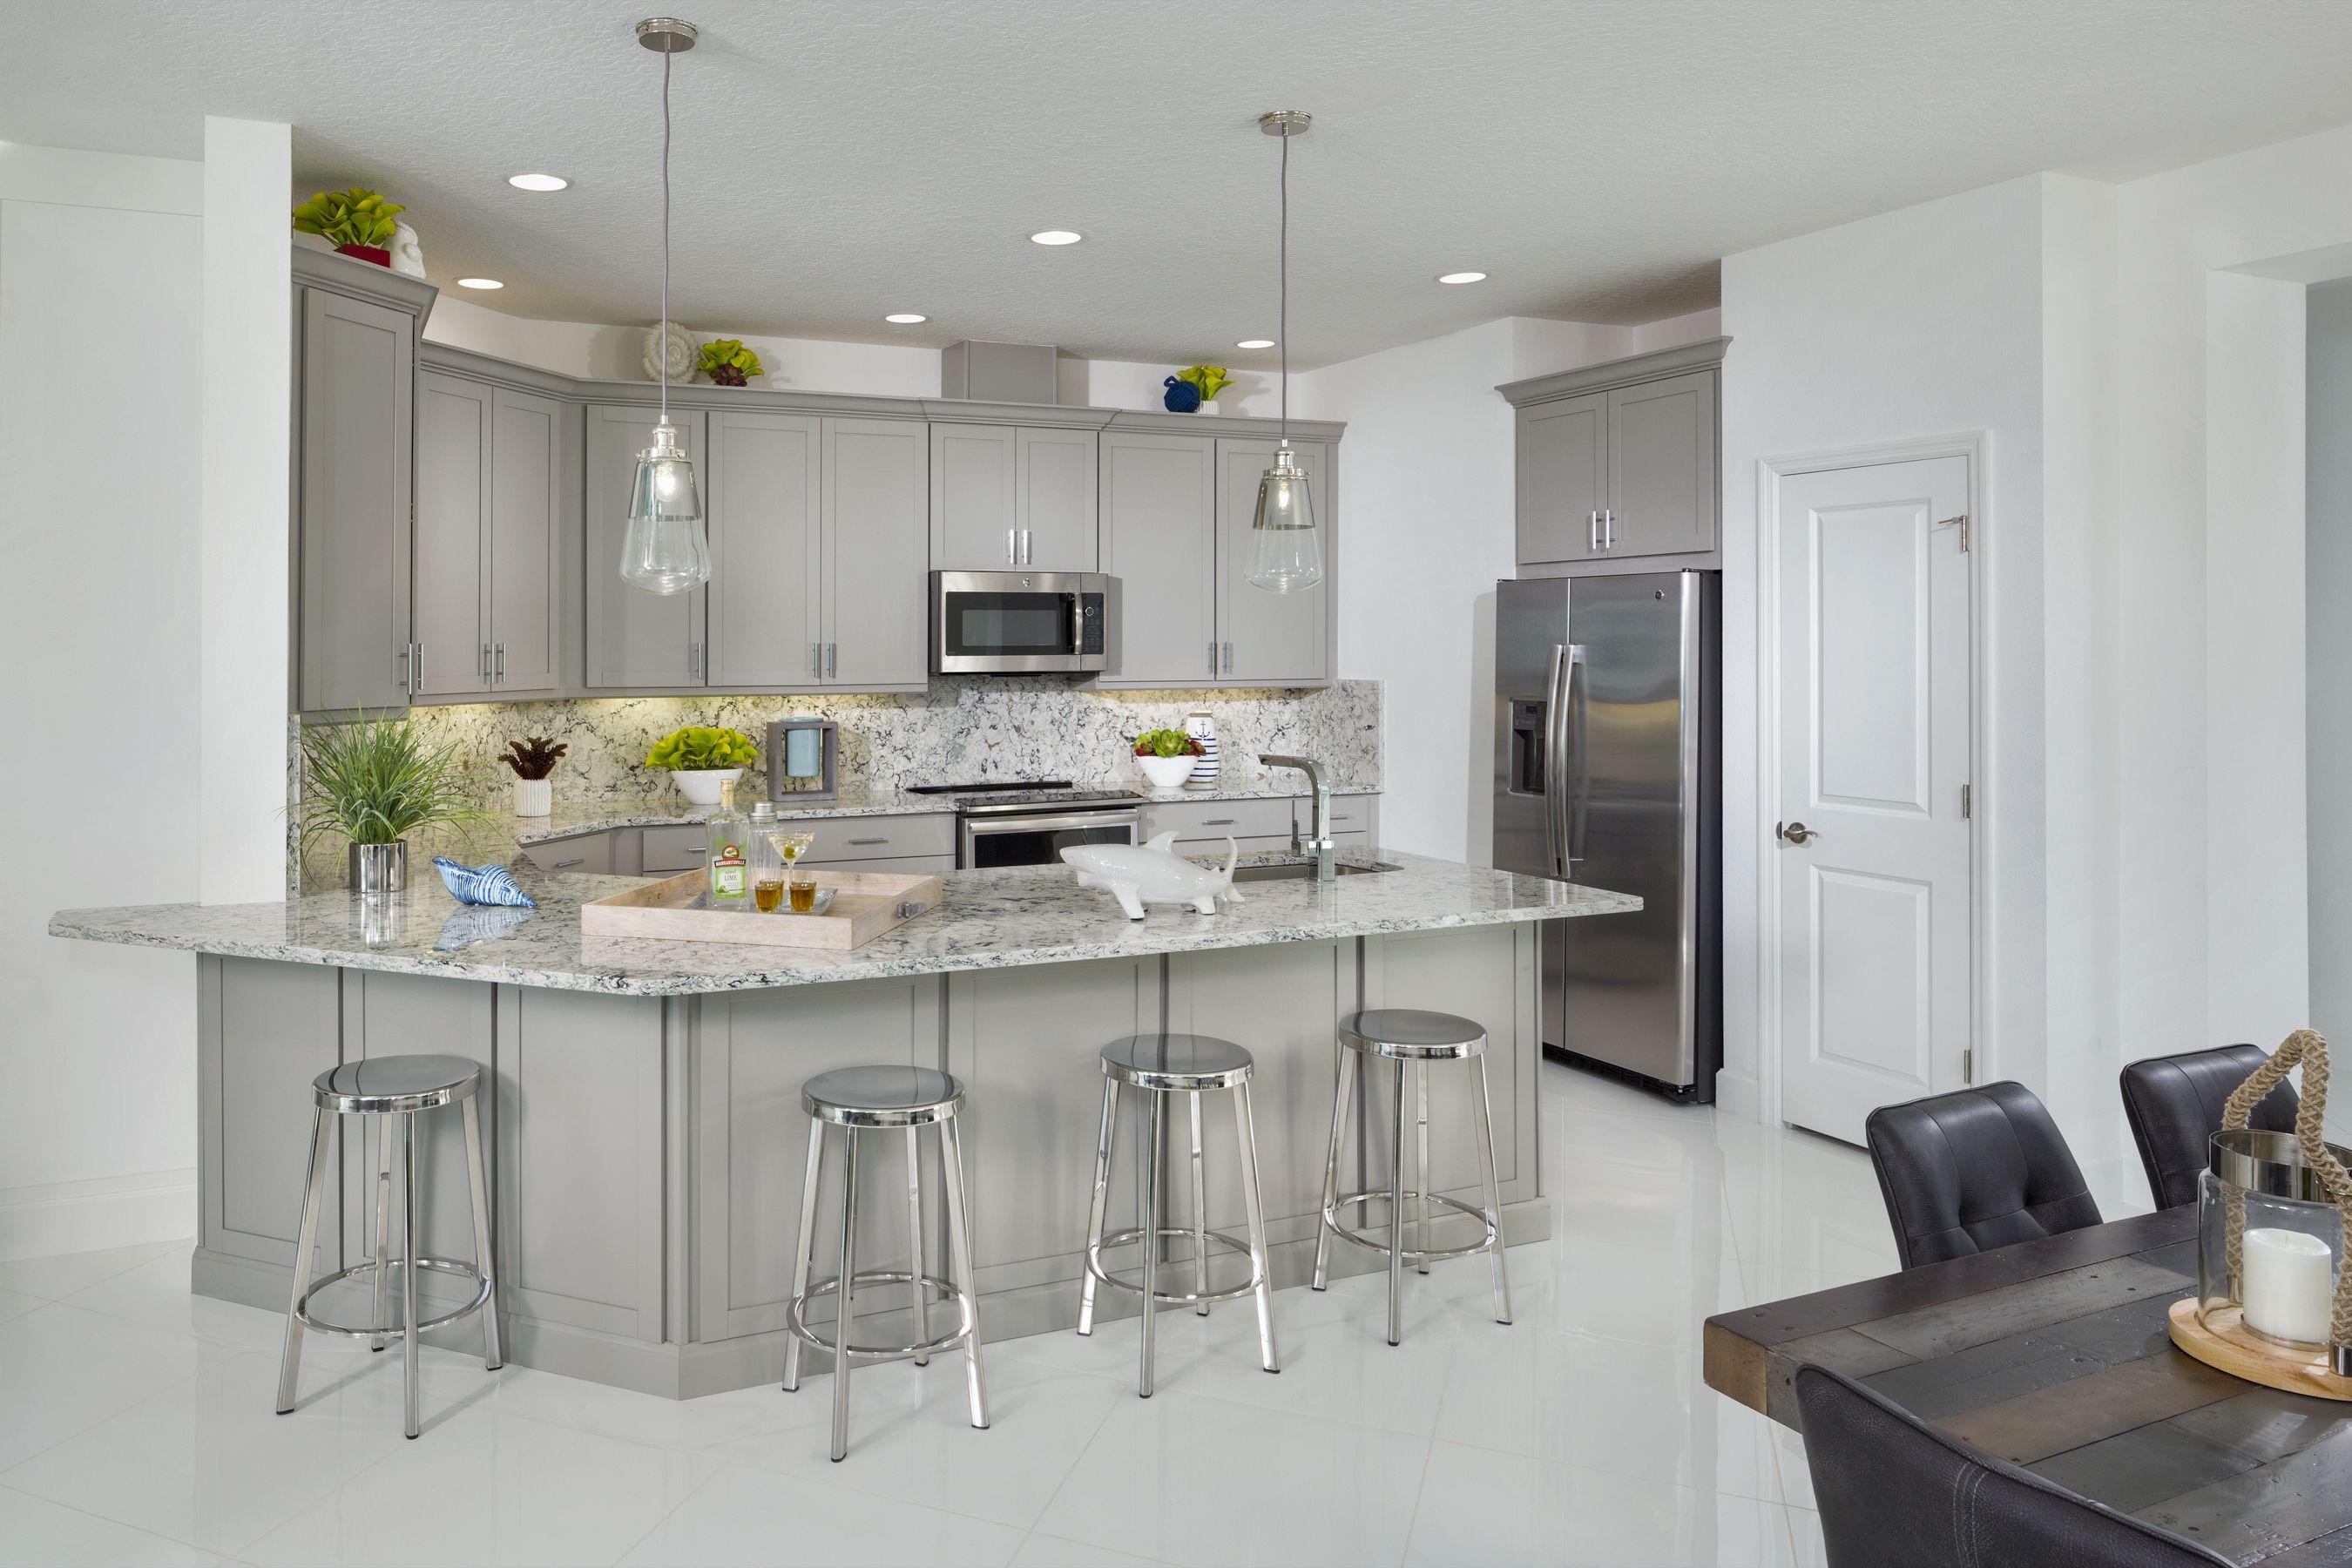 Barbuda Model At Latitude Margaritaville Daytona Beach Minto Communities New Homes Breakfast Bar Kitchen Kitchen Diner